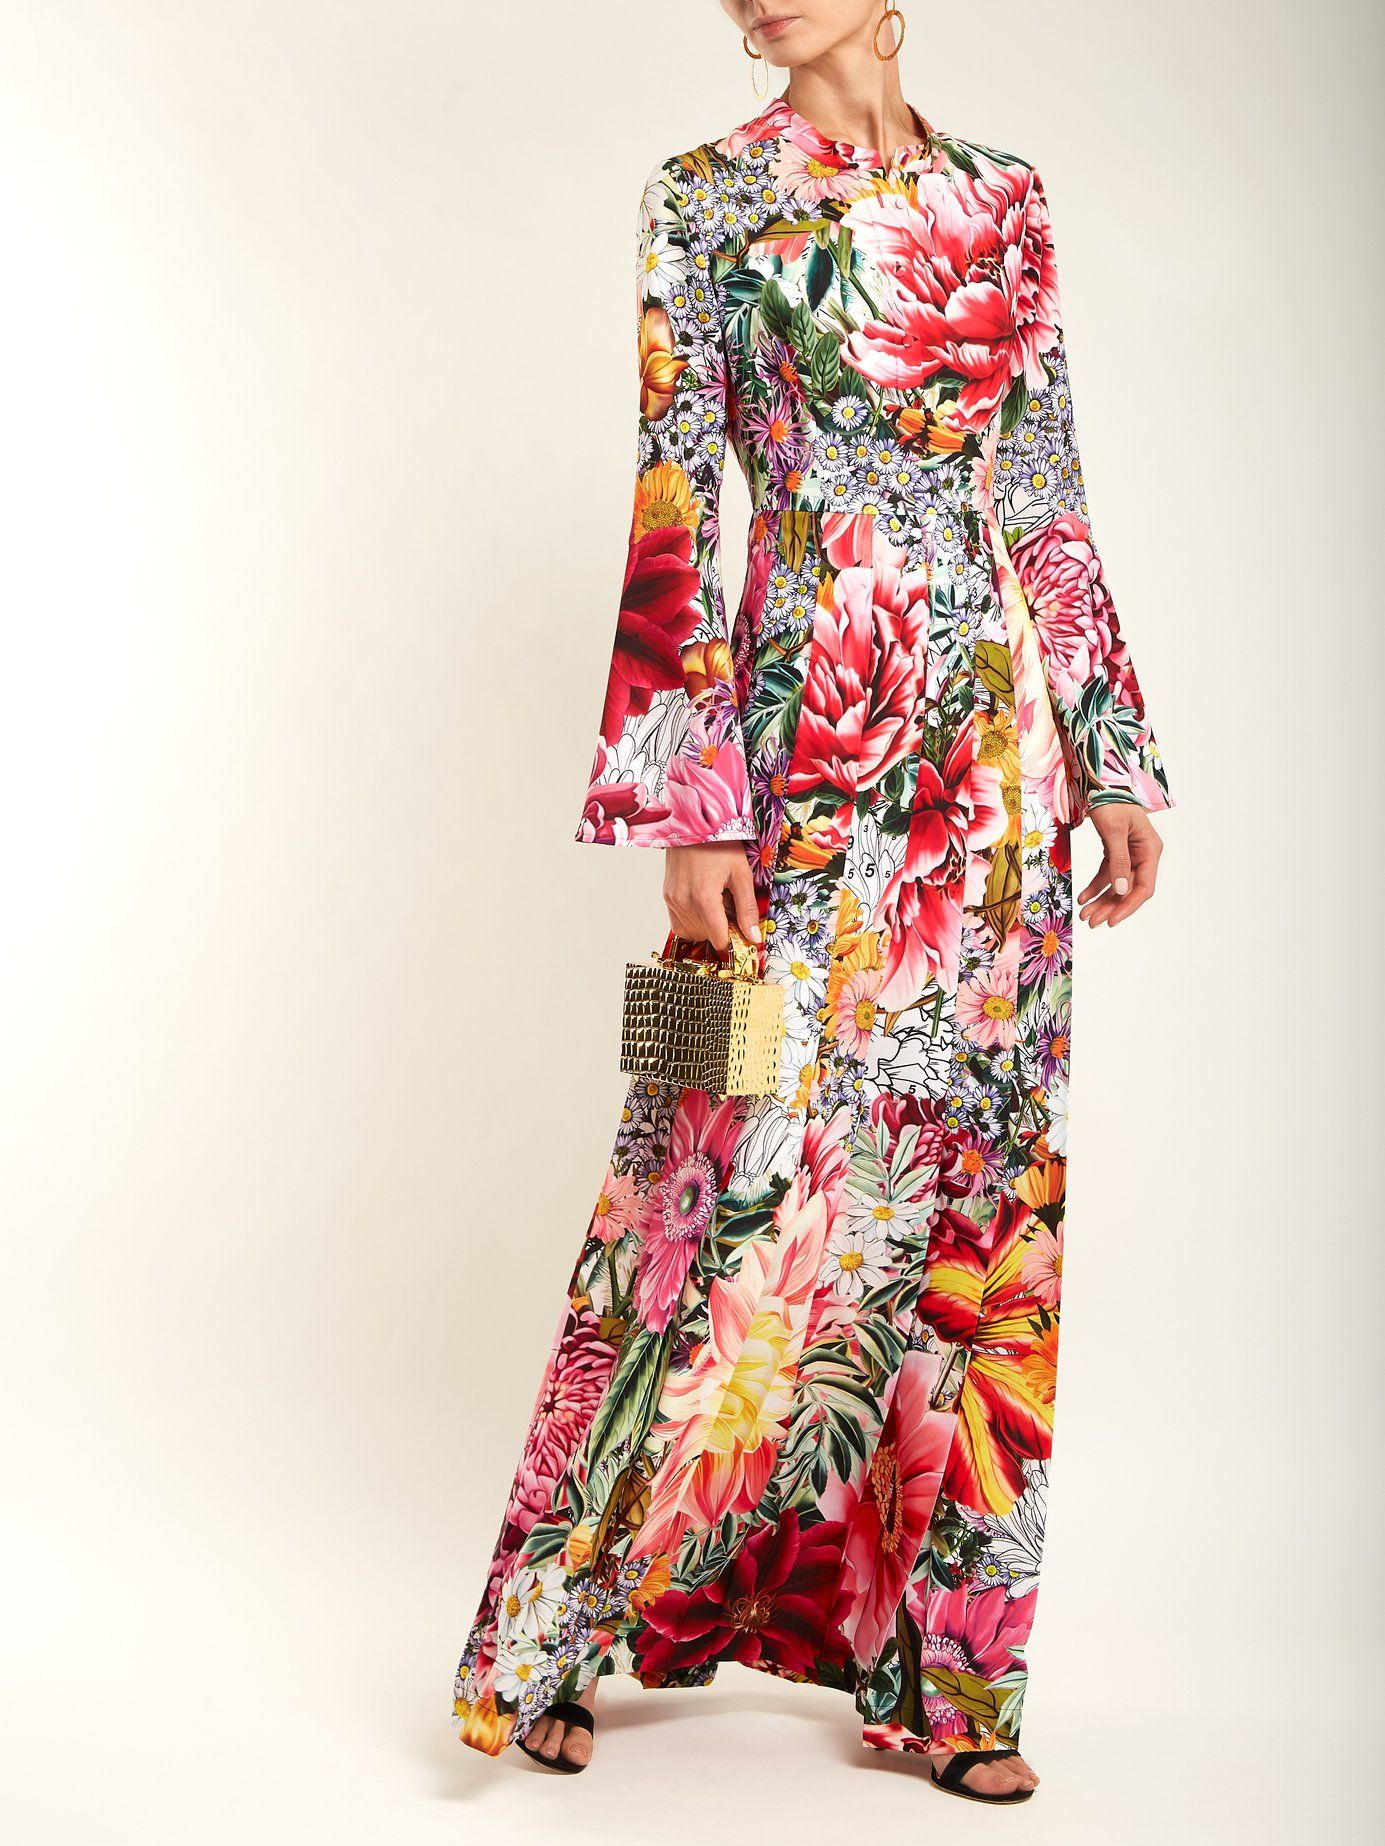 Desmine floral-printed crepe dress Mary Katrantzou dOmIBbO